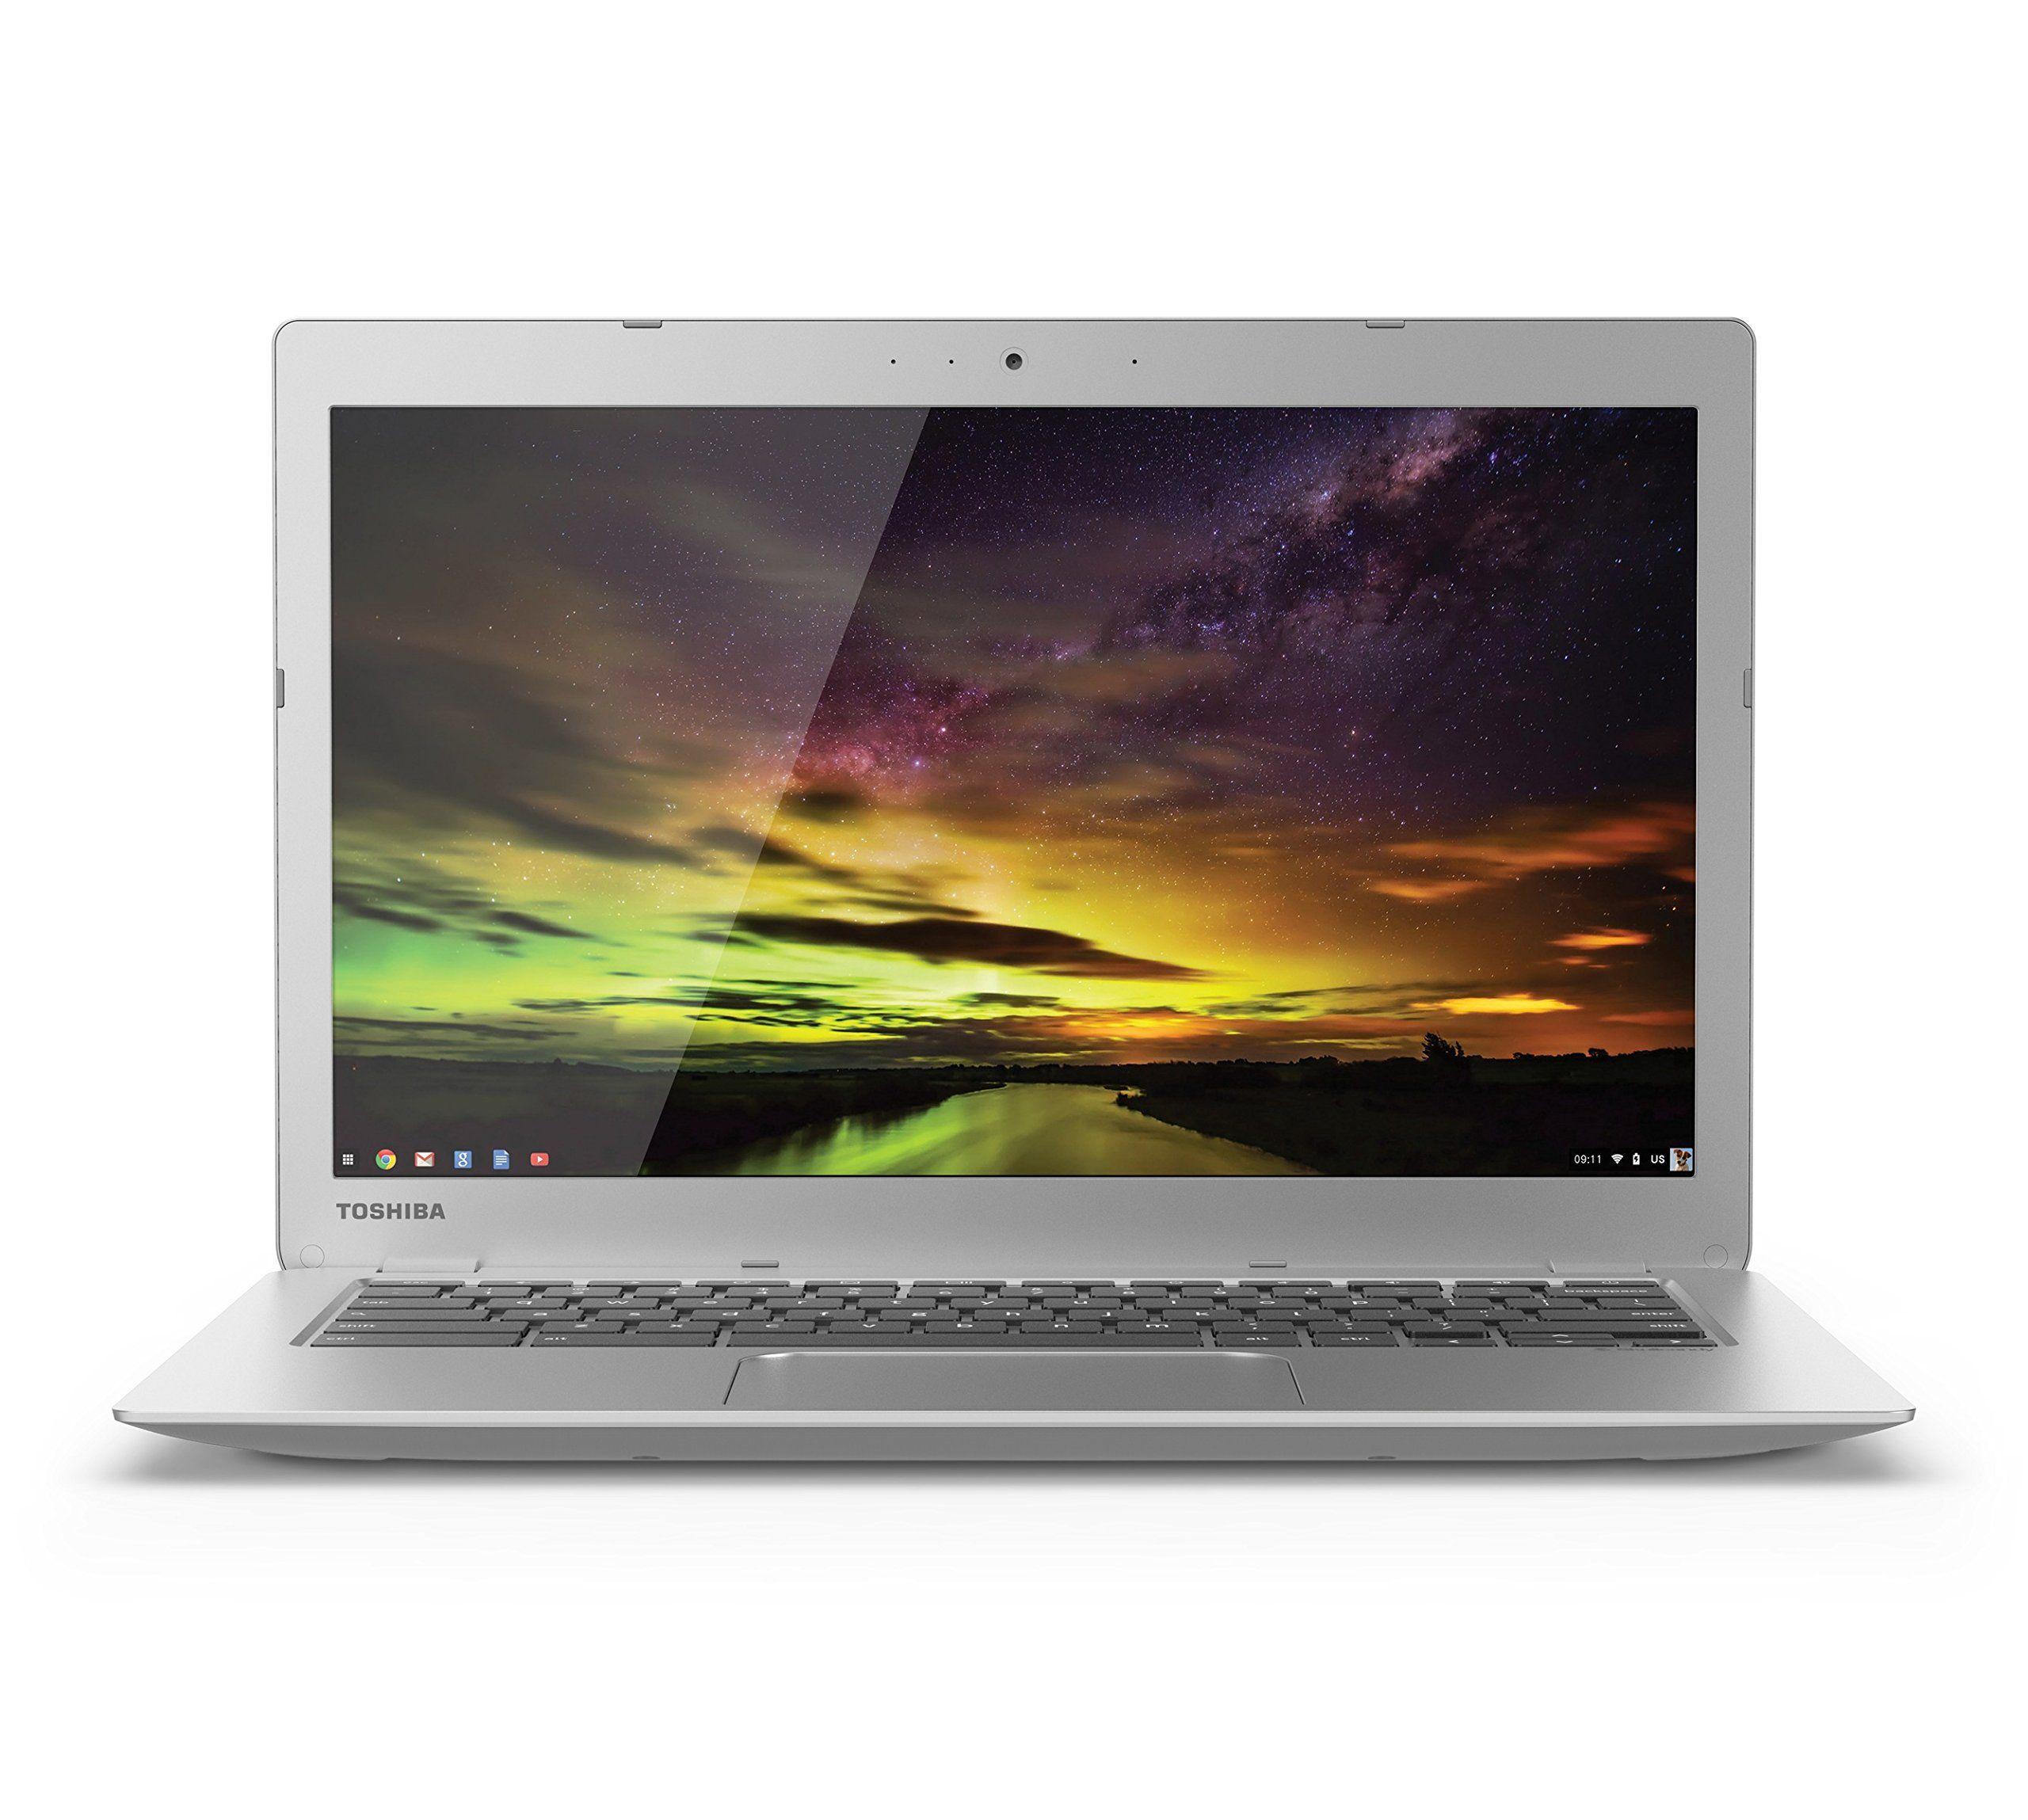 Toshiba Cb35 B3340 13 3 Inch Chromebook Intel Celeron 4gb 16gb Ssd Silver Full Hd Screen Chromebook Laptop Toshiba Laptop Deals